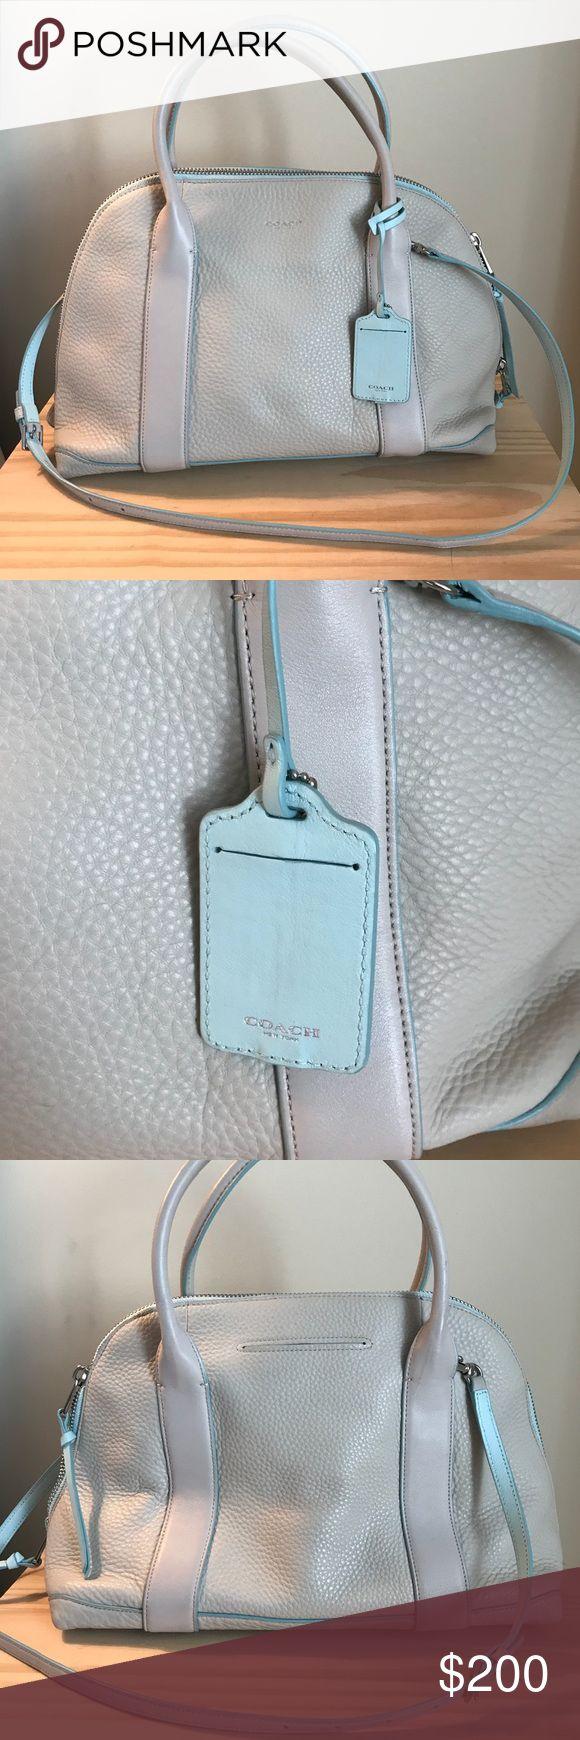 Distressed gray leather bag - everyday hobo shoulder